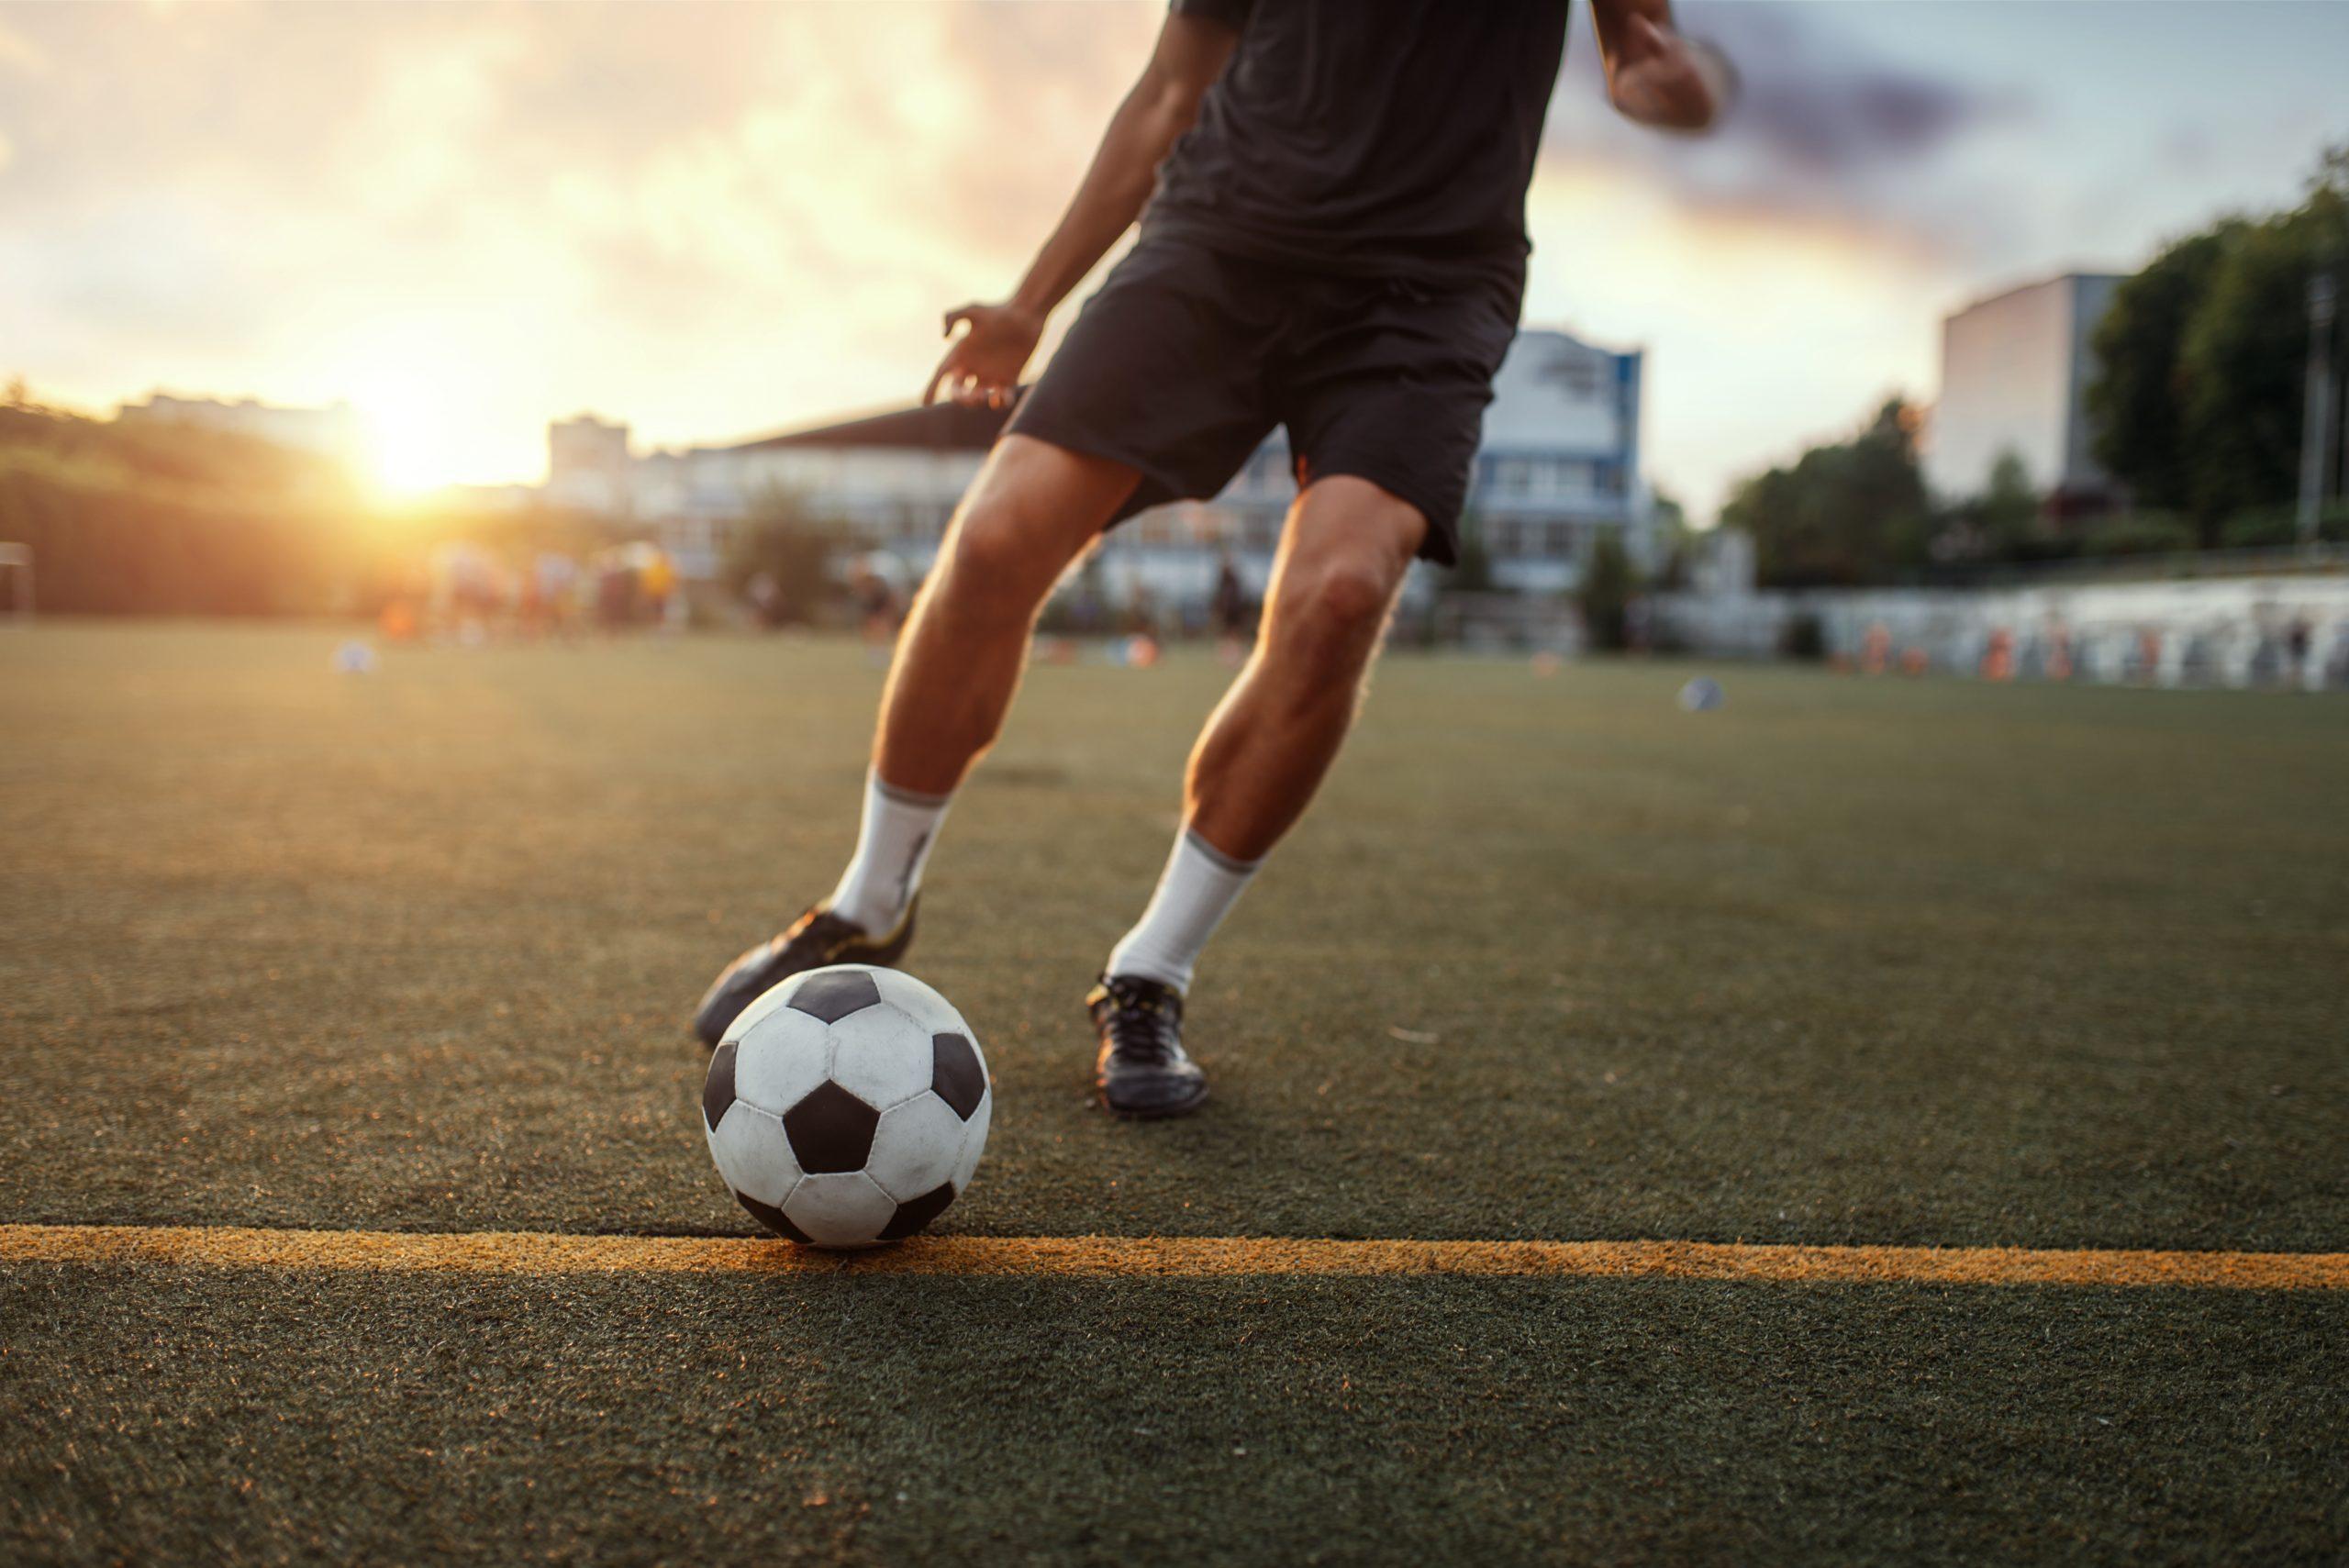 Head injury in sport: Football injuries